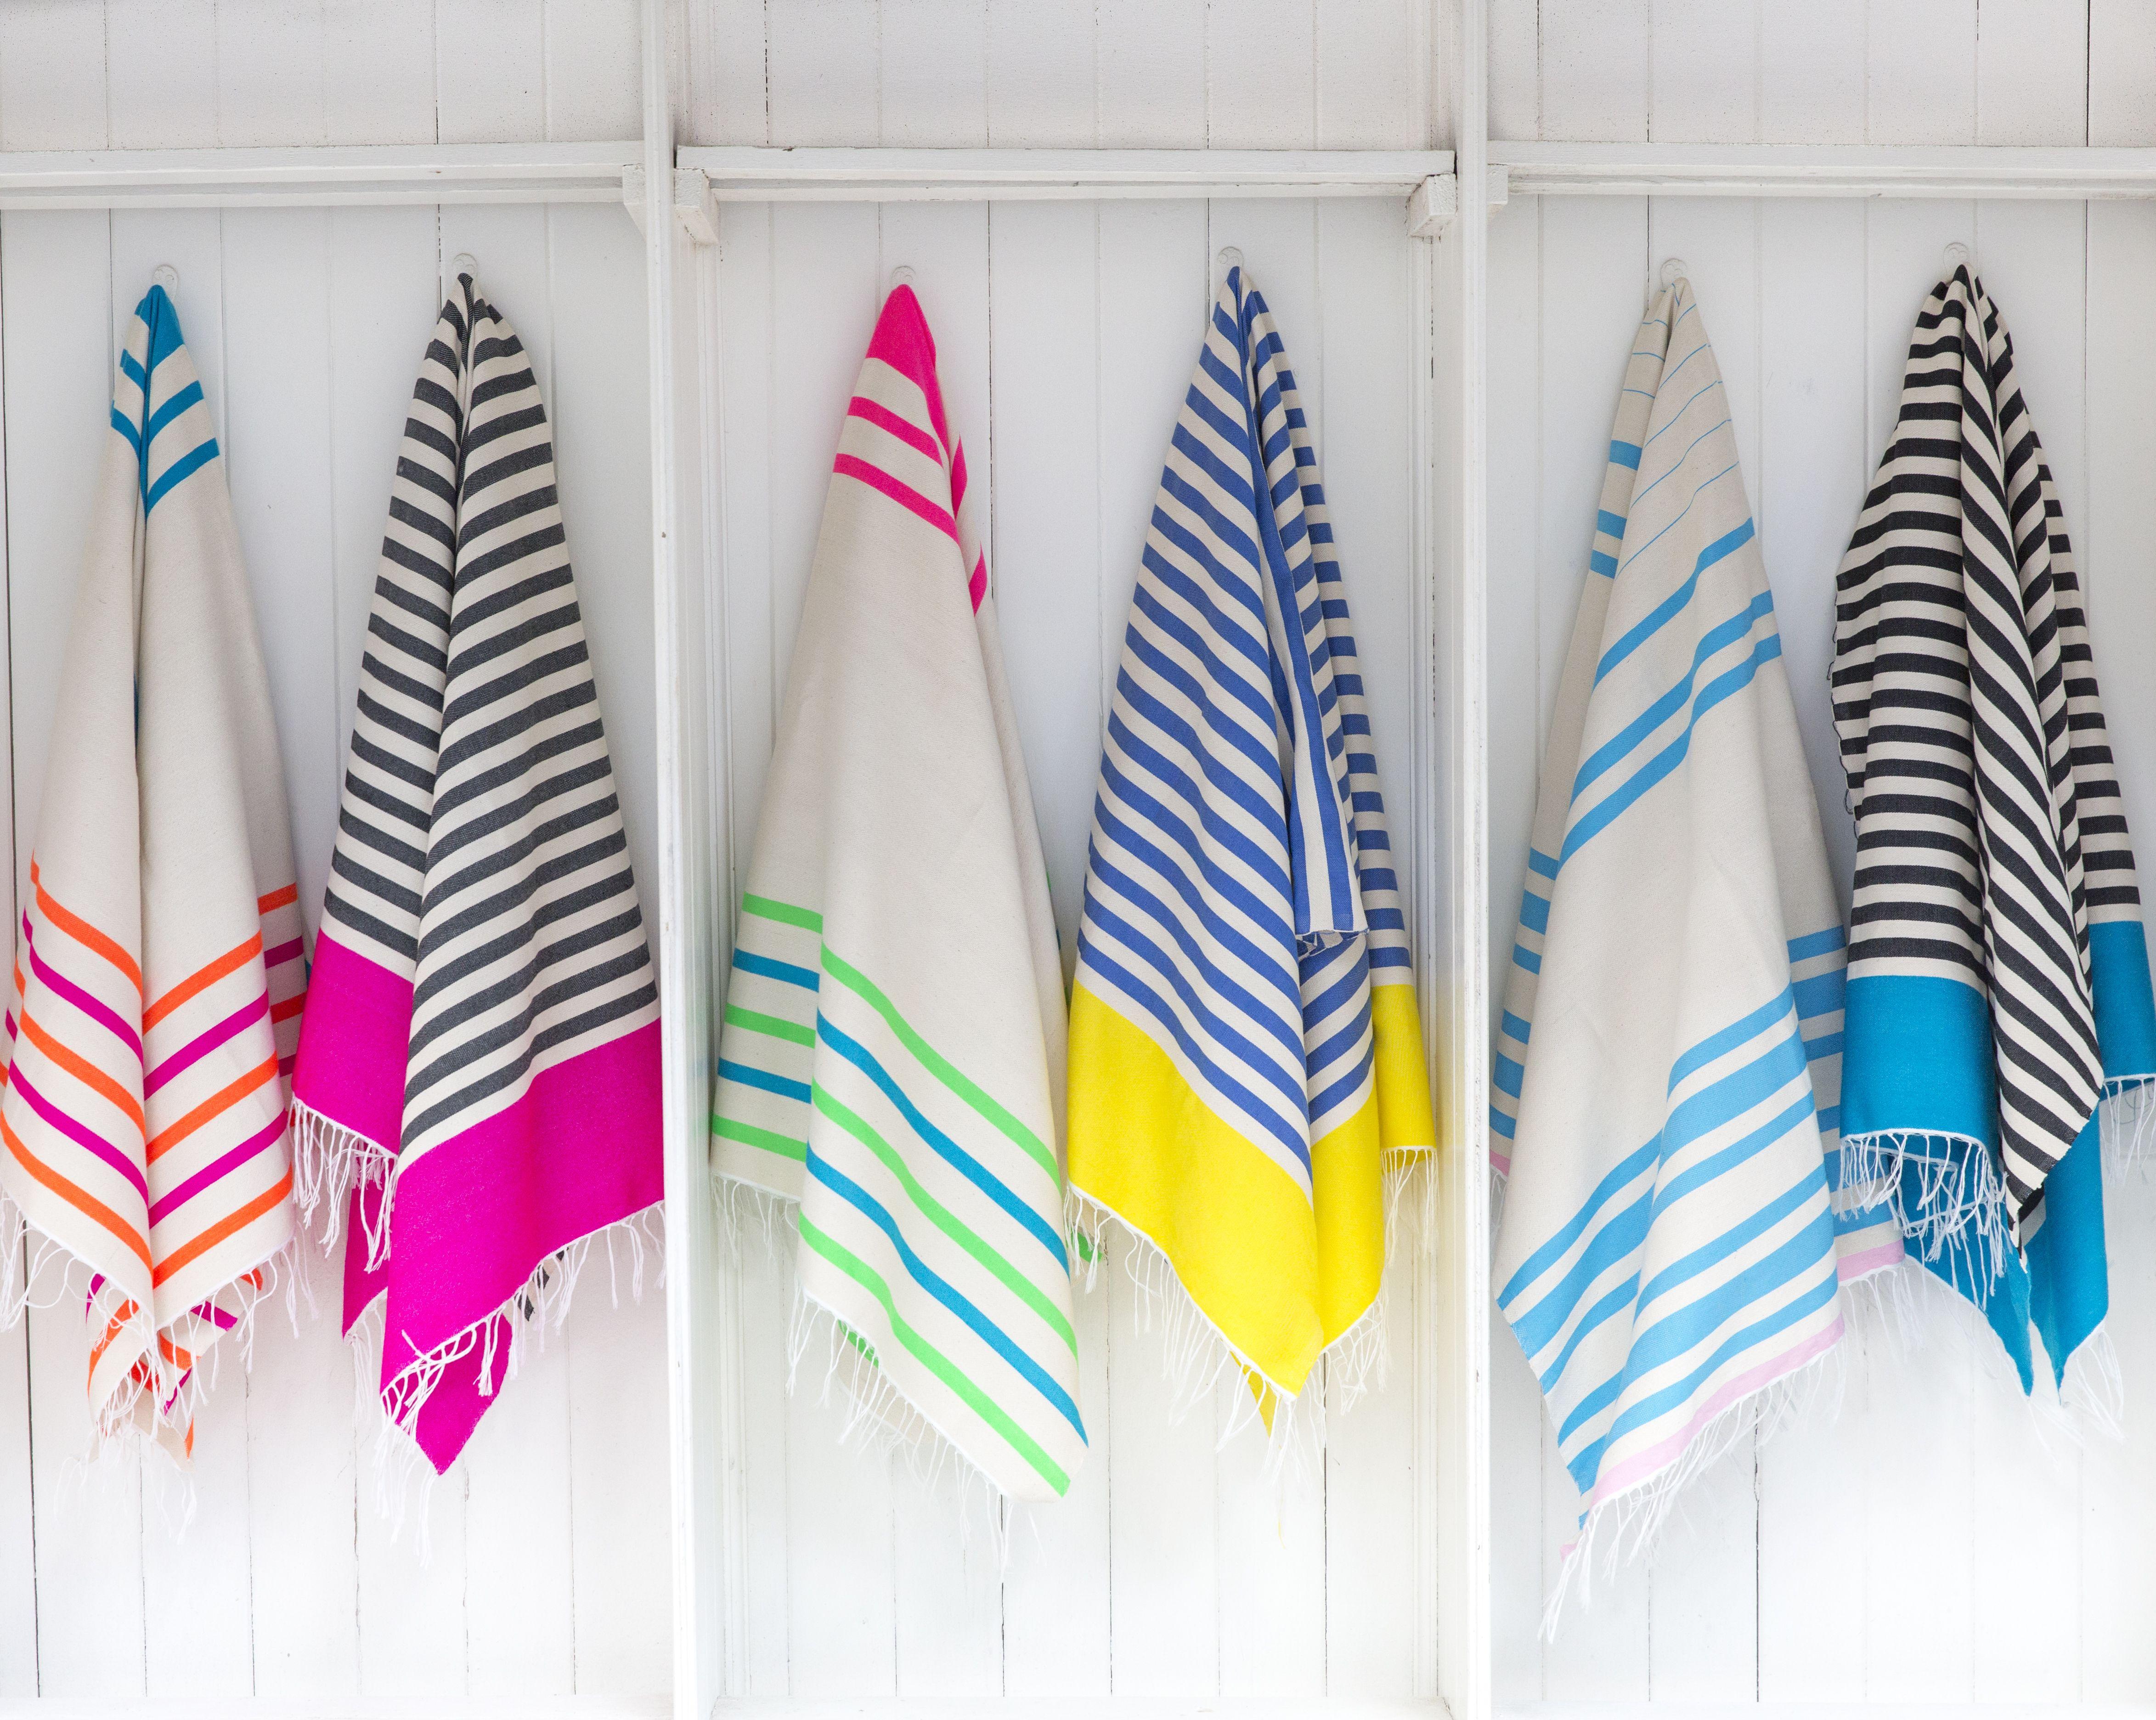 Moroccan Handmade Bath Beach Towel Cotton Striped Nicely For Hammam /& Bathroom